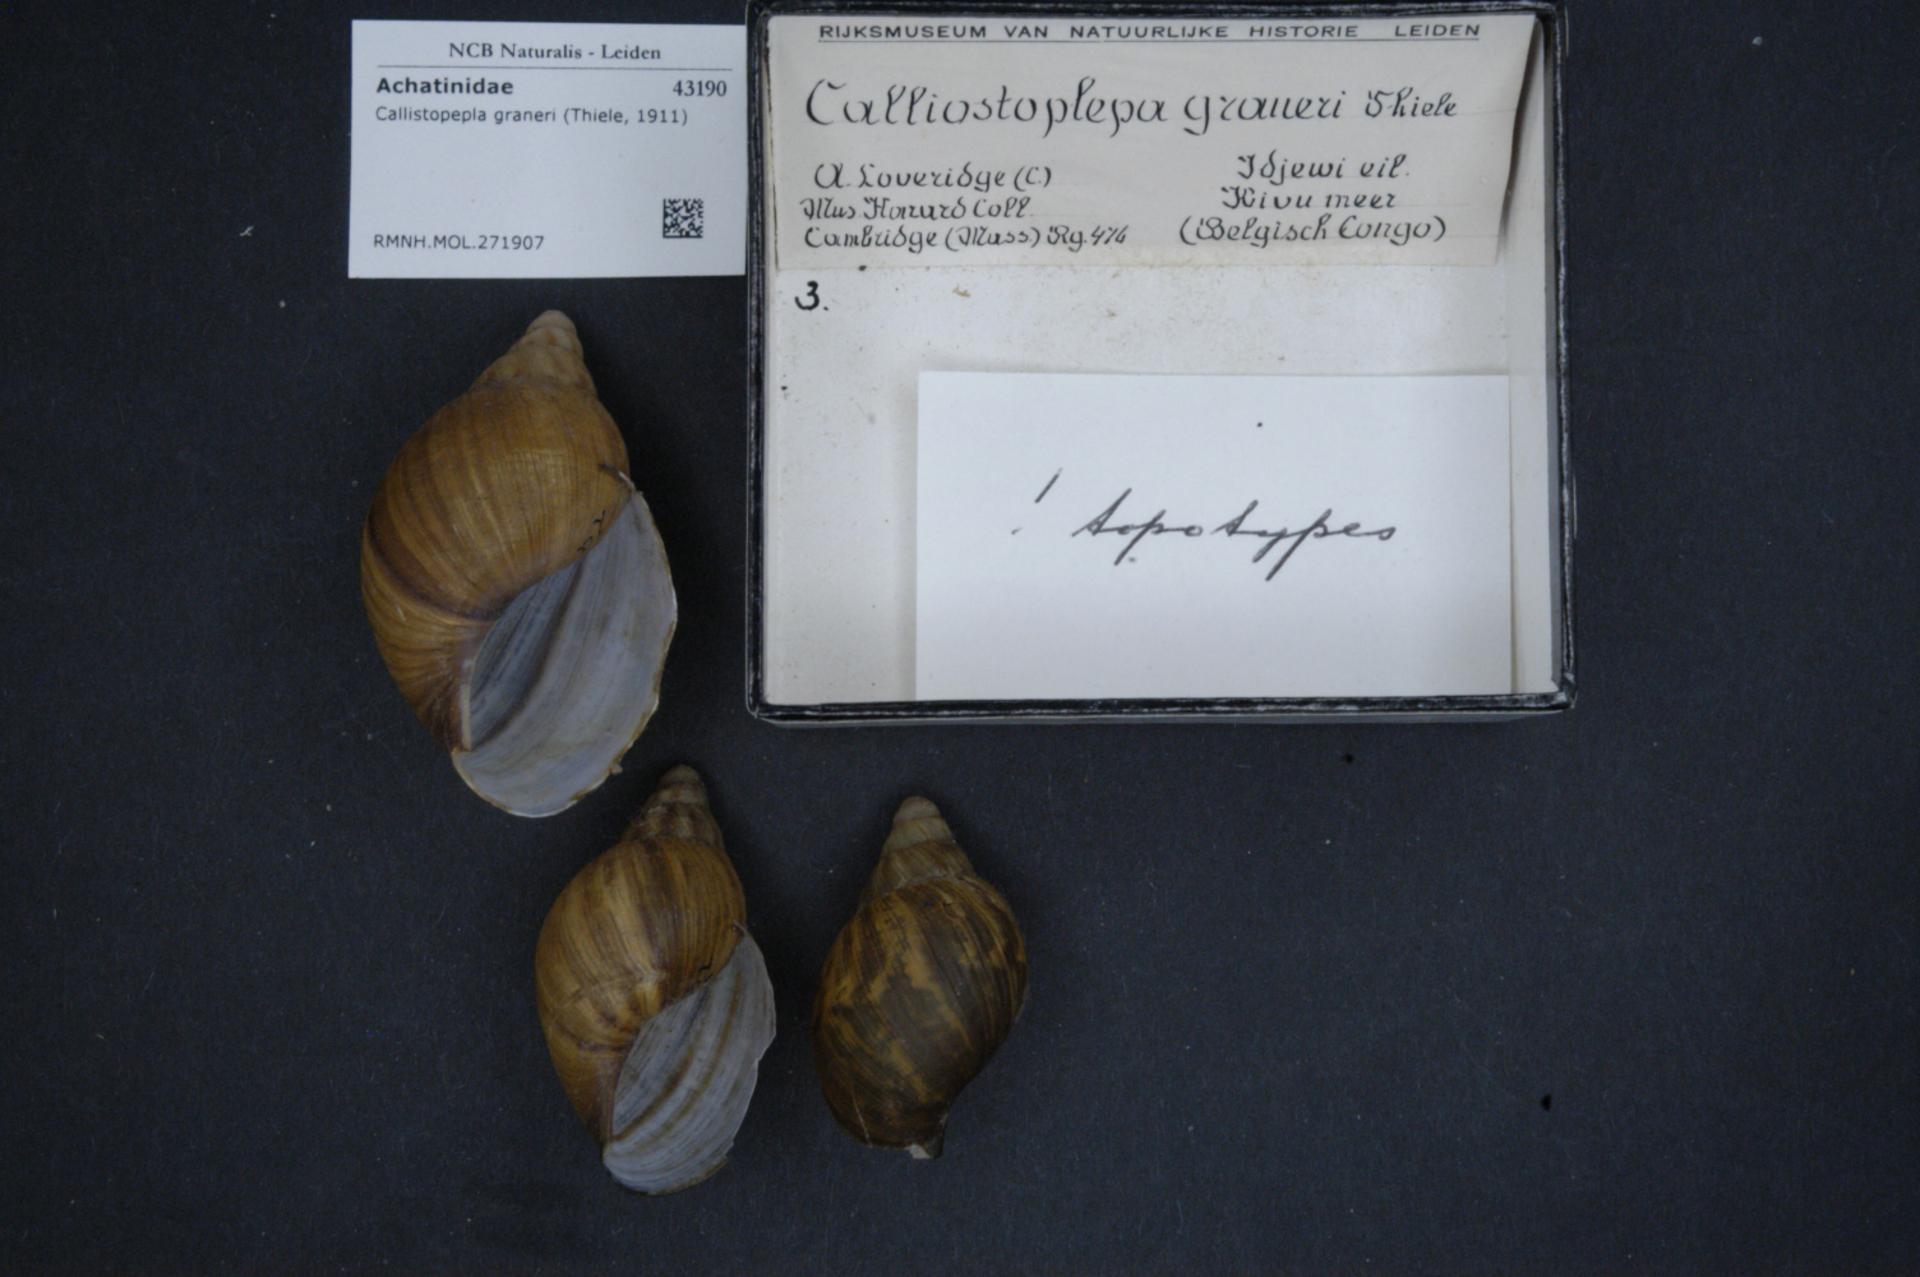 fc053f2d2fae File Naturalis Biodiversity Center - RMNH.MOL.271907 - Callistopepla  graneri (Thiele